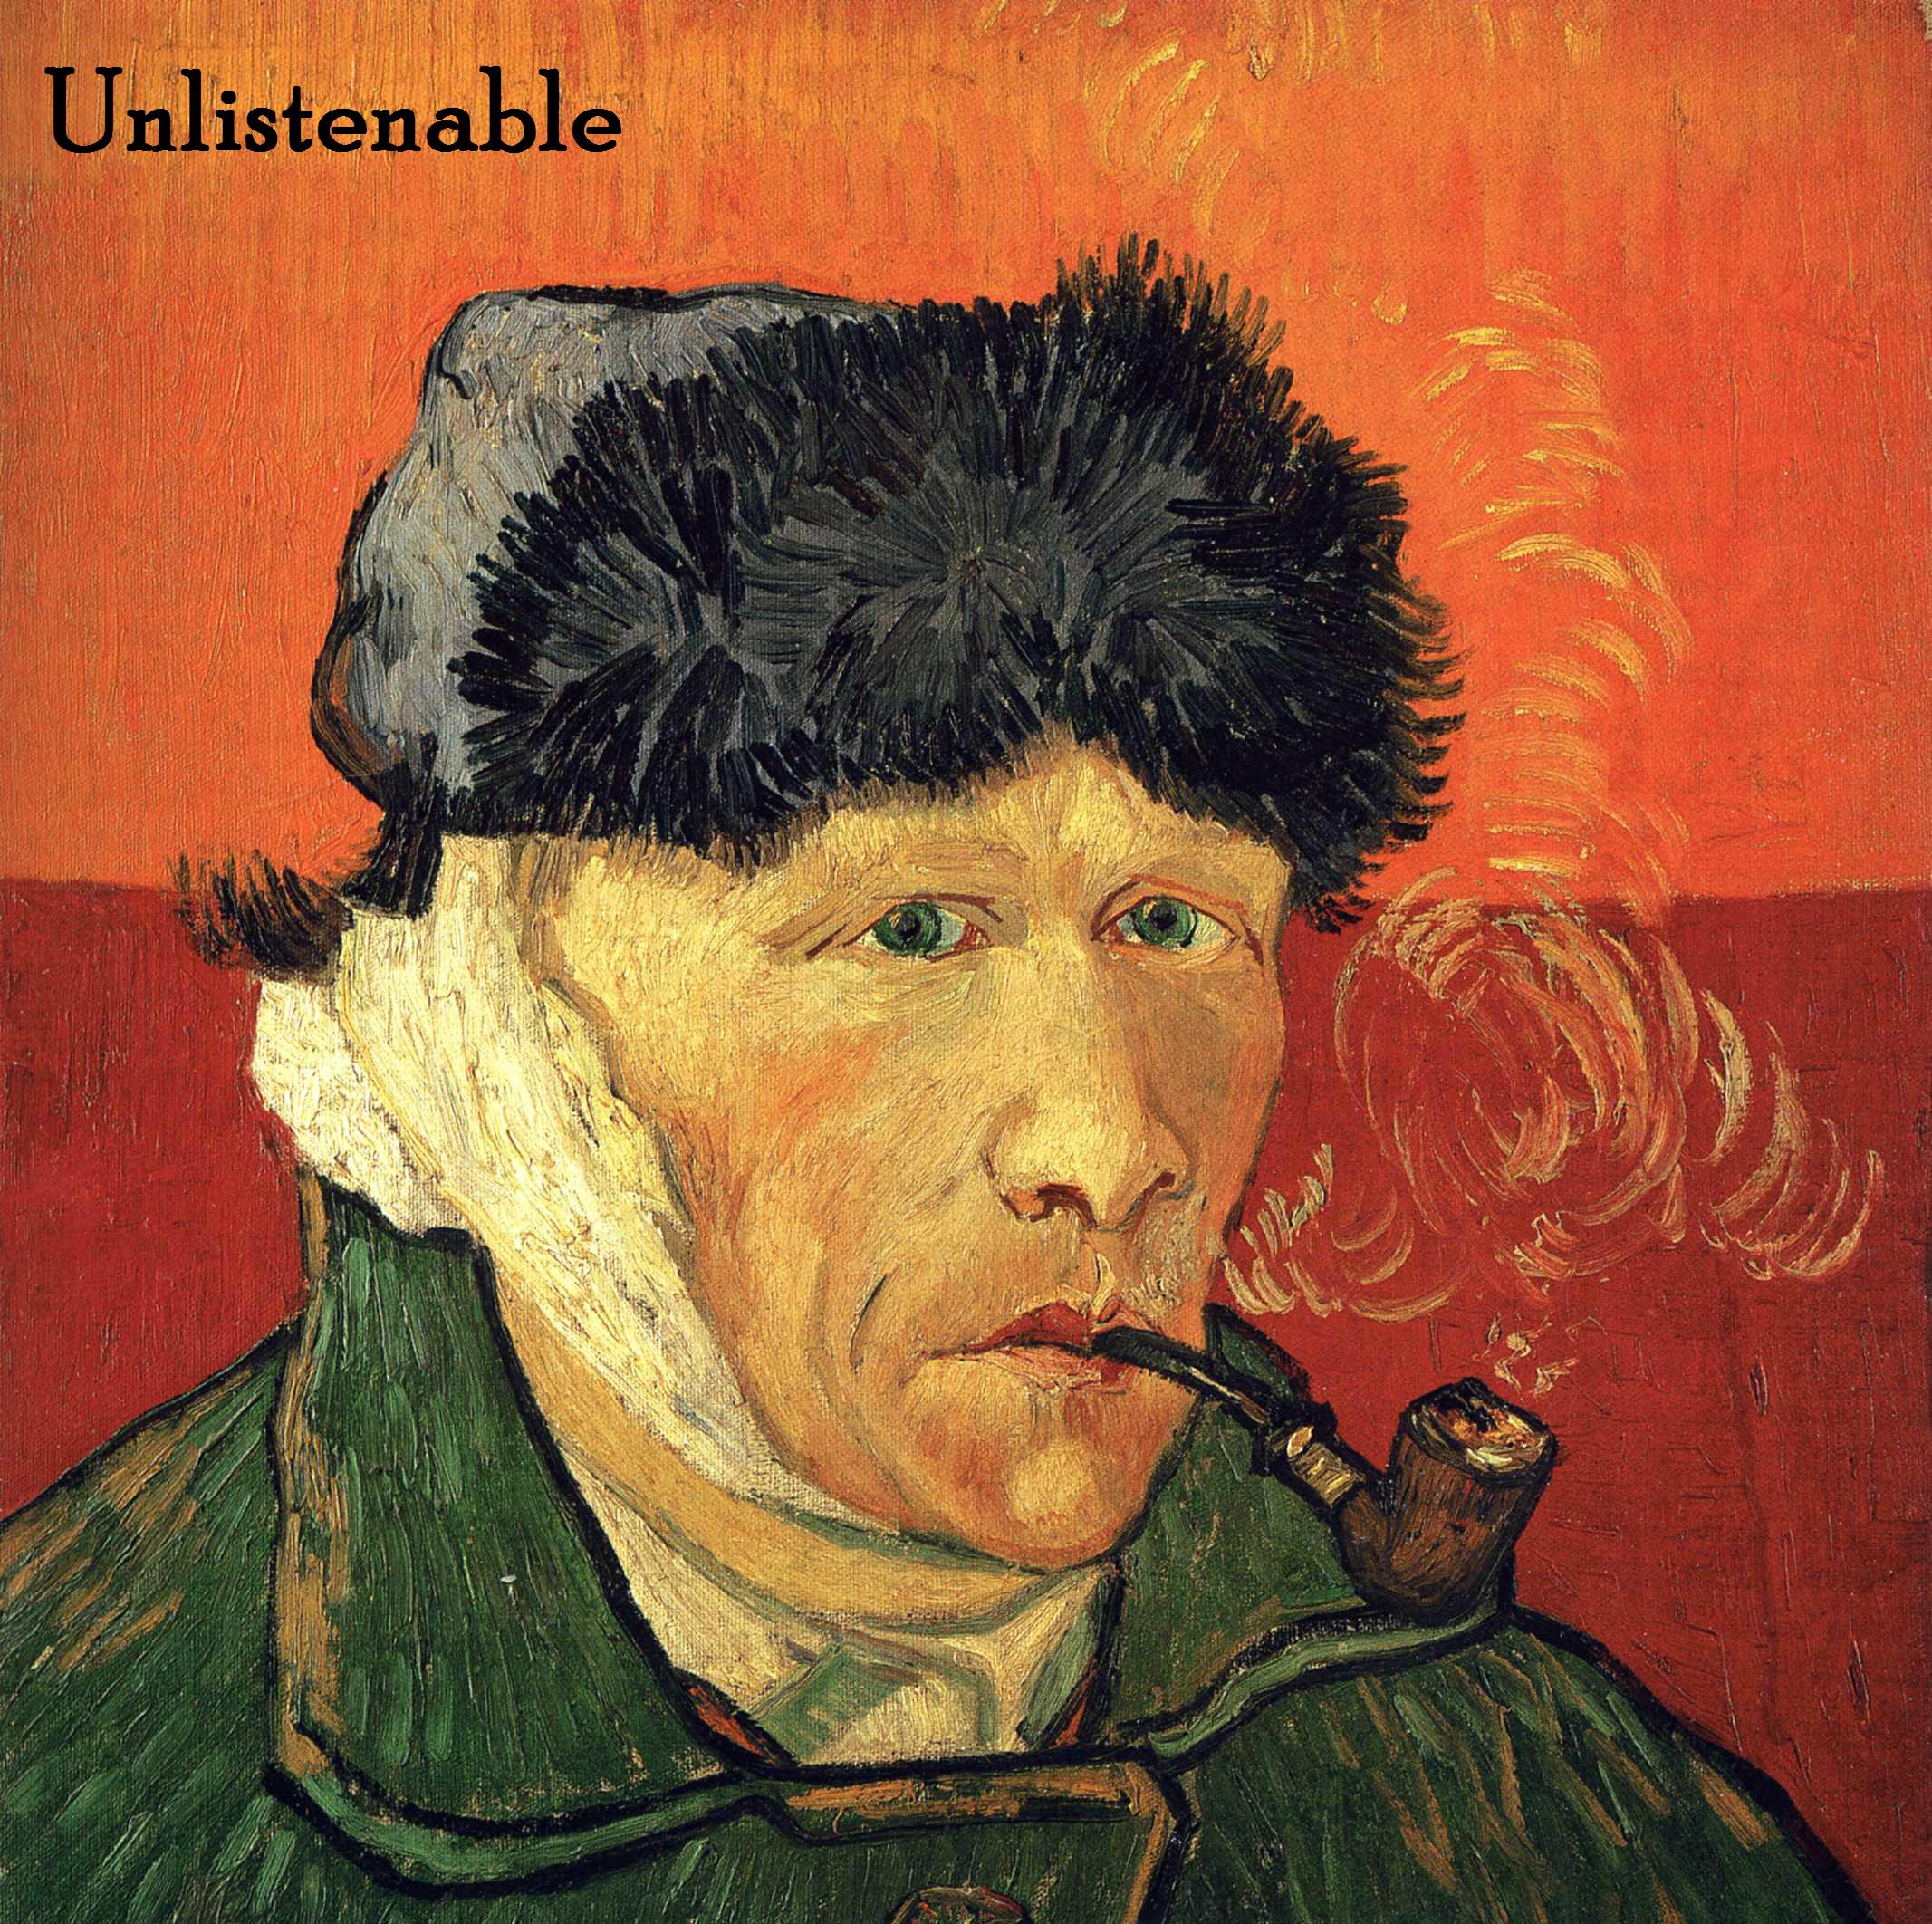 Unlistenable